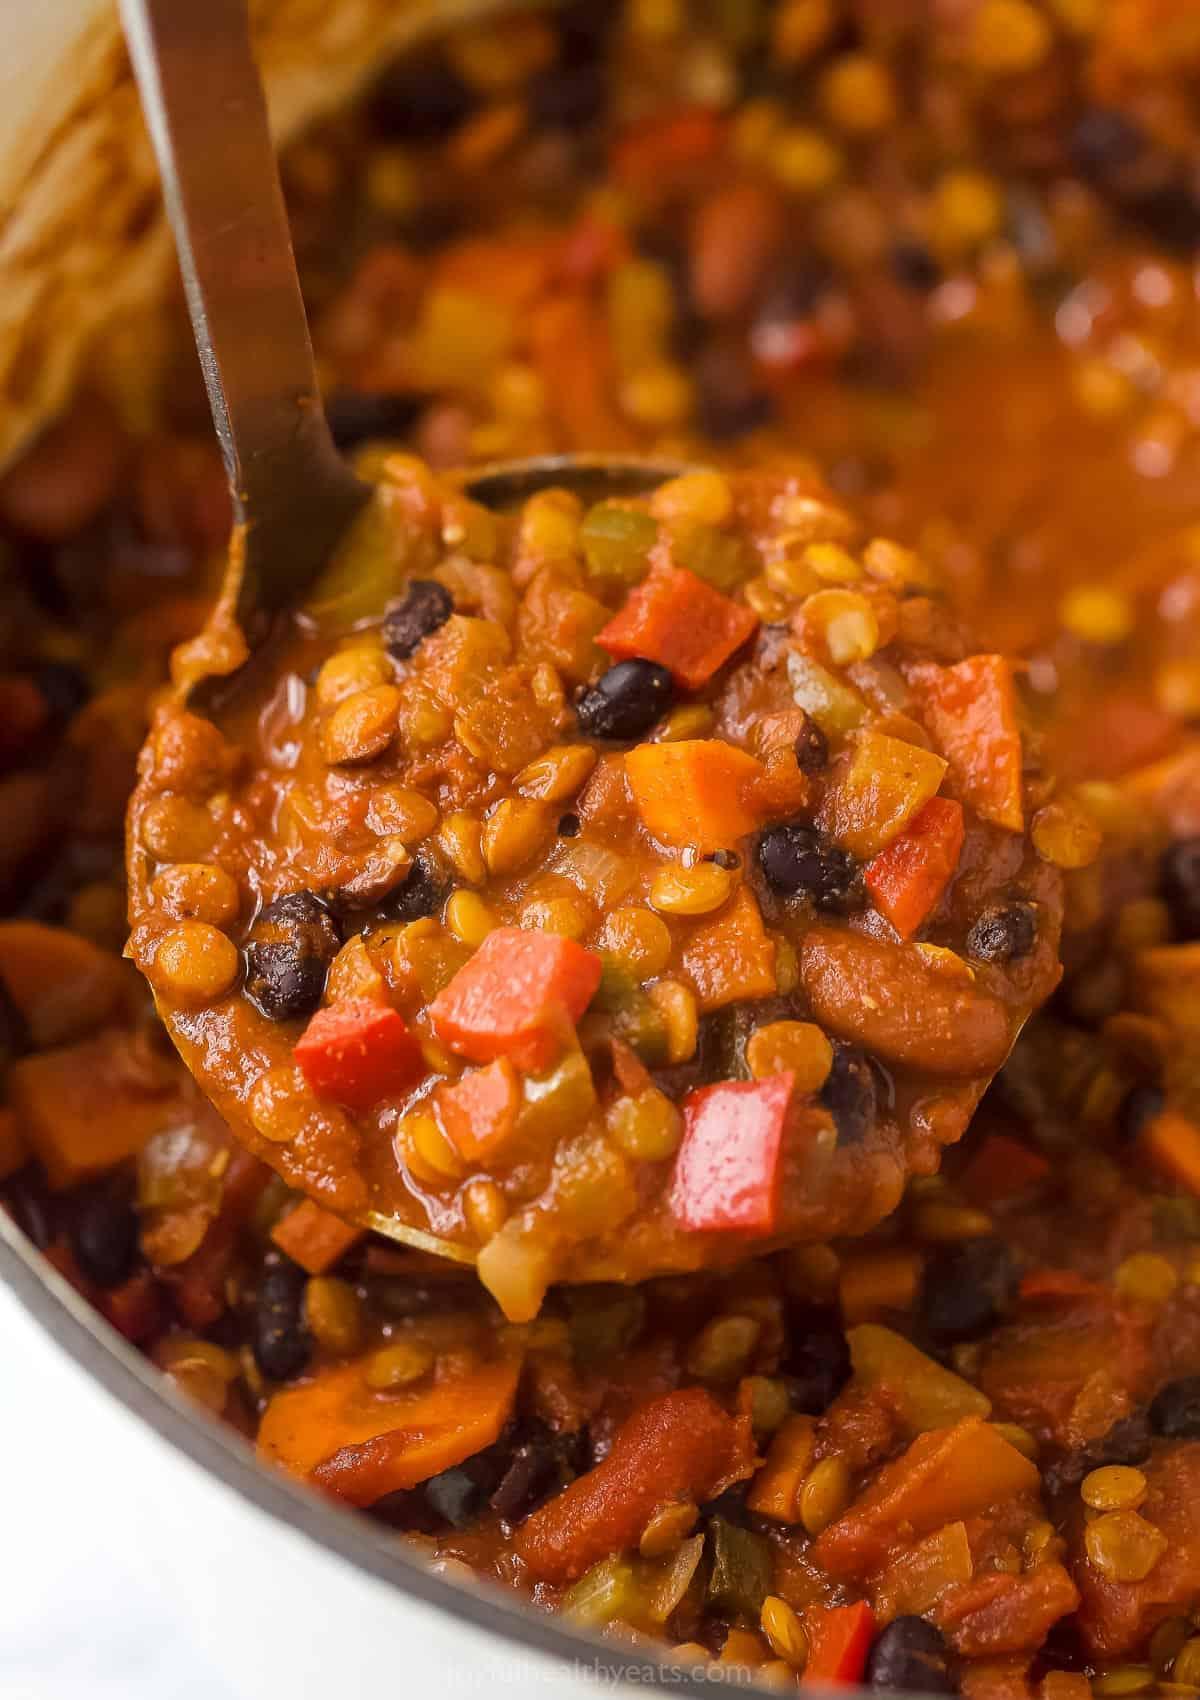 ladel scooping lentil chili